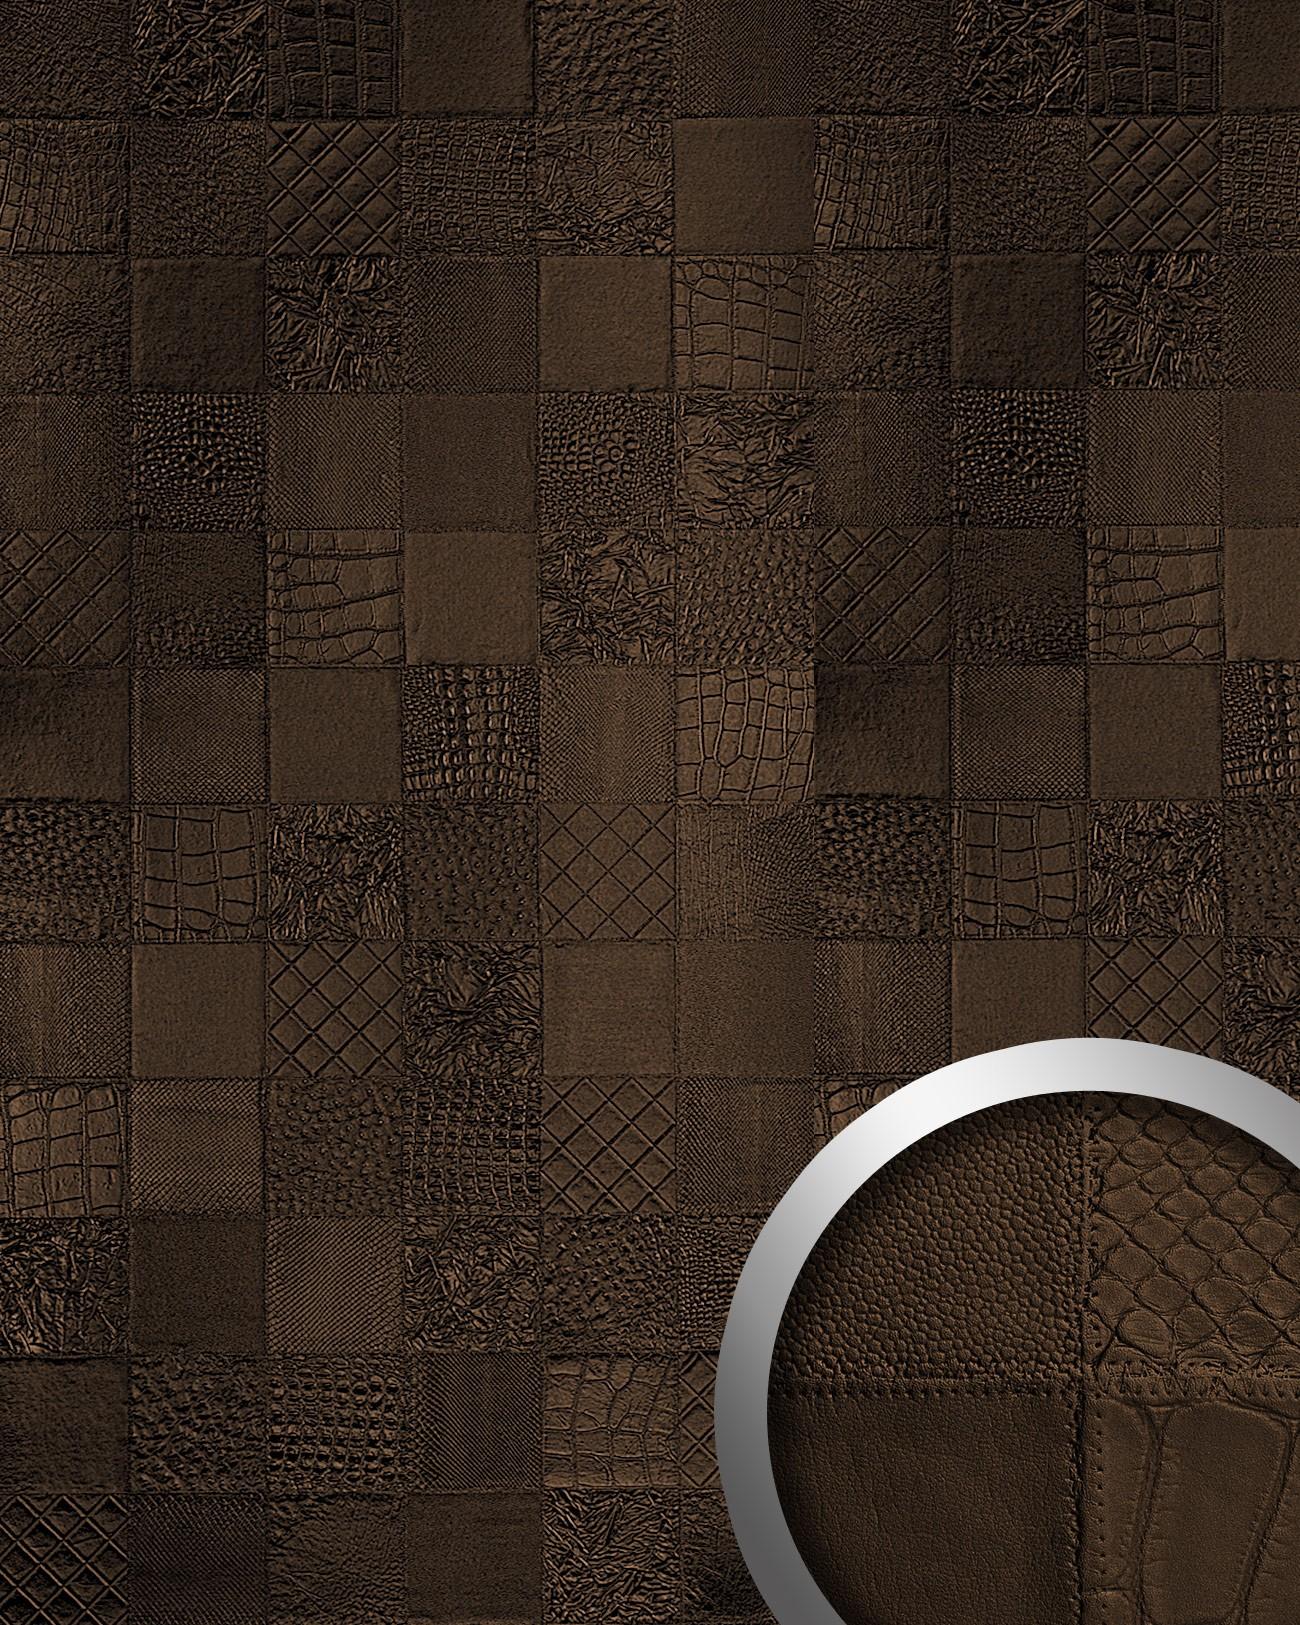 3d panel decorativo autoadhesivo polipiel de dise o mosaico wallface 15038 collage relieve - Papel autoadhesivo decorativo ...